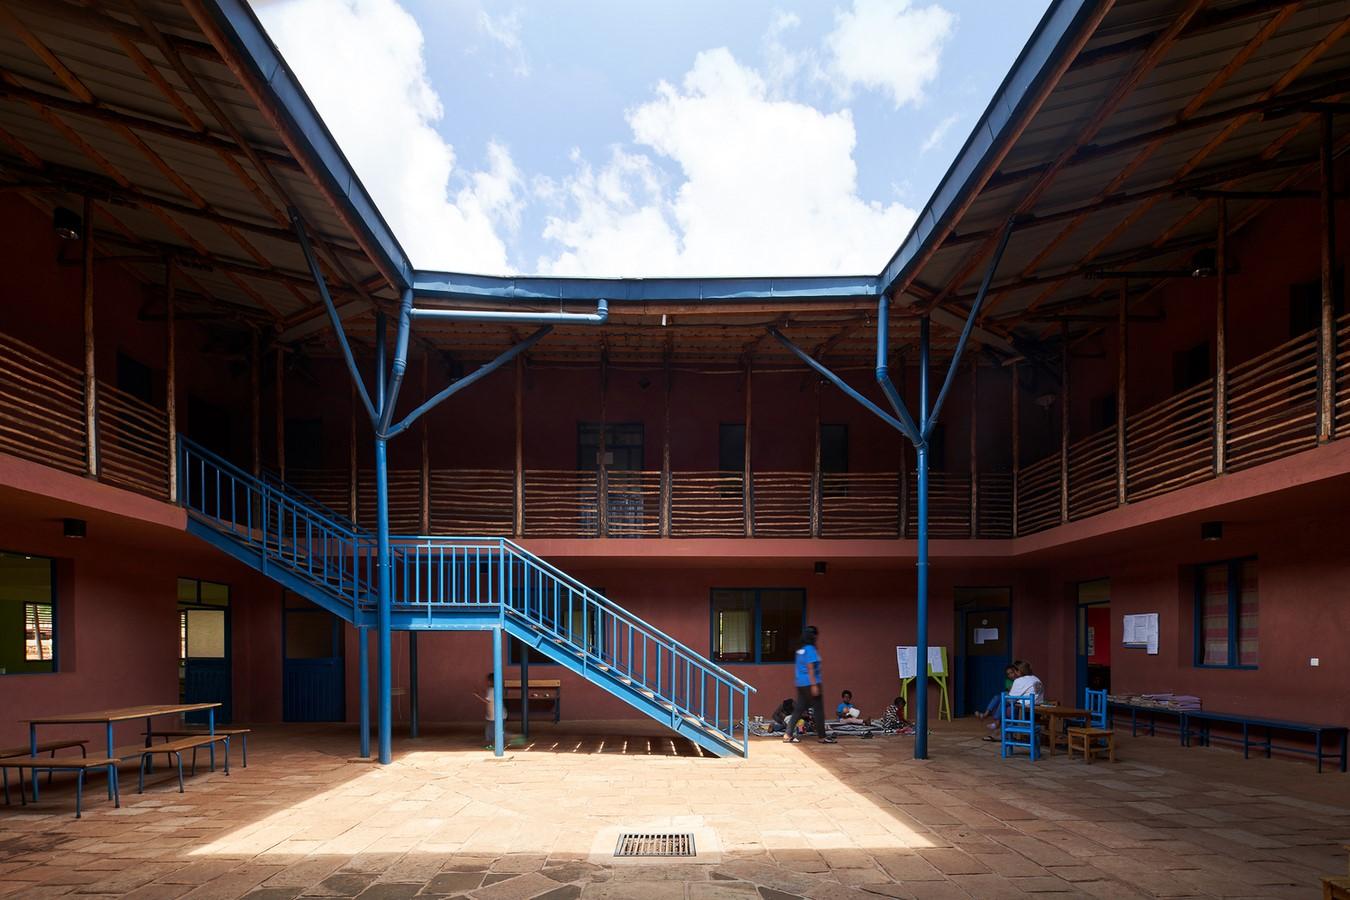 Ethiopian Campus dedicated to street children designed by By StudioBenaim - Sheet5